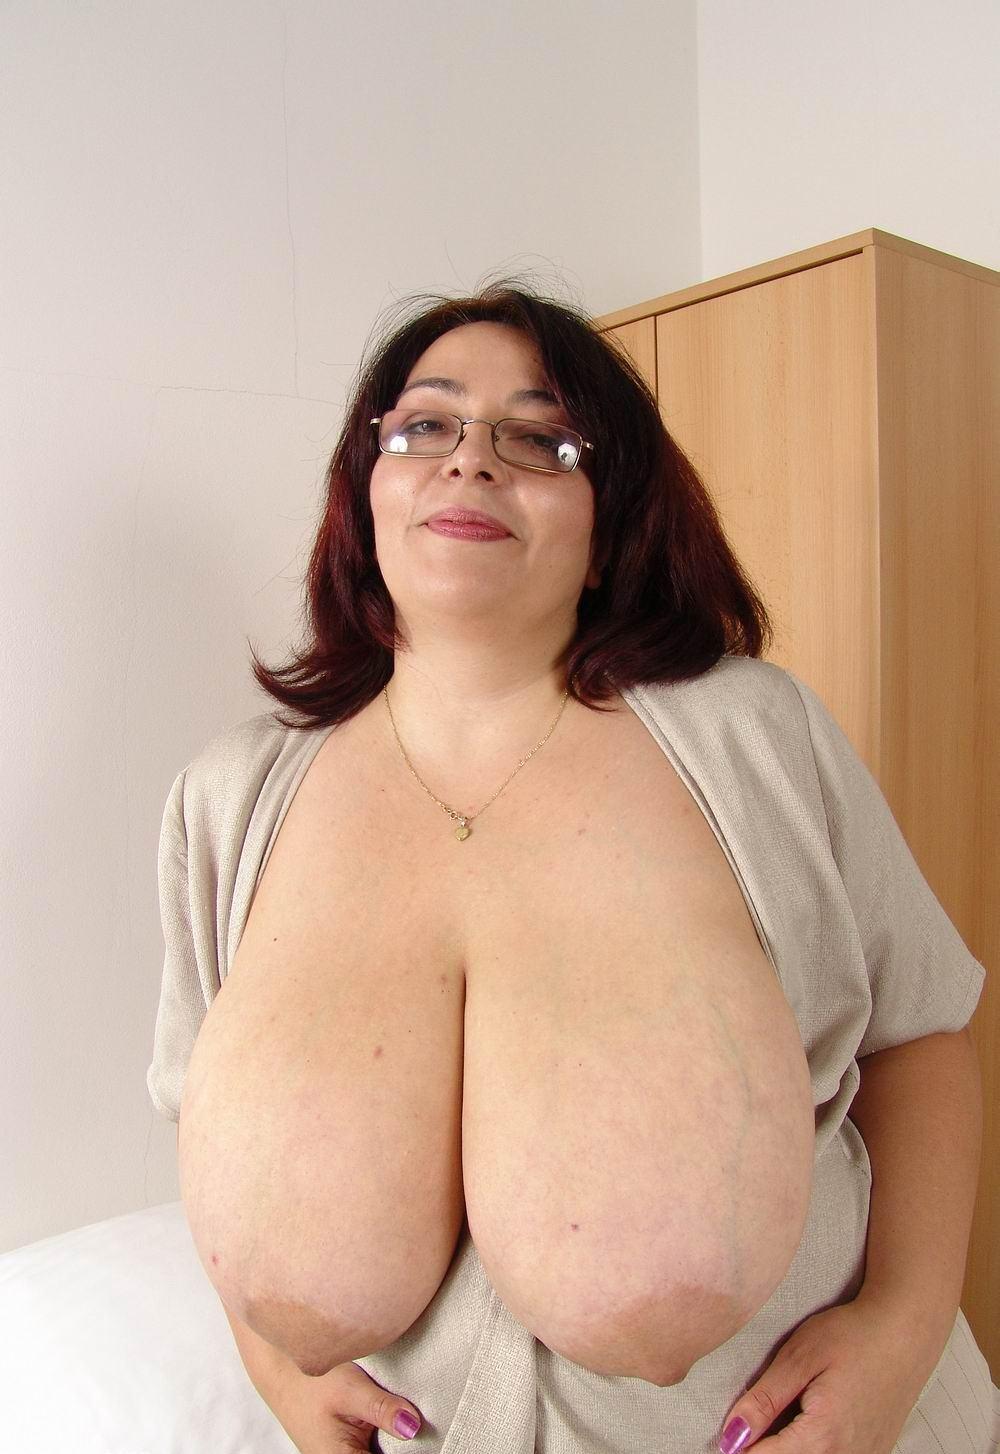 naked web cams